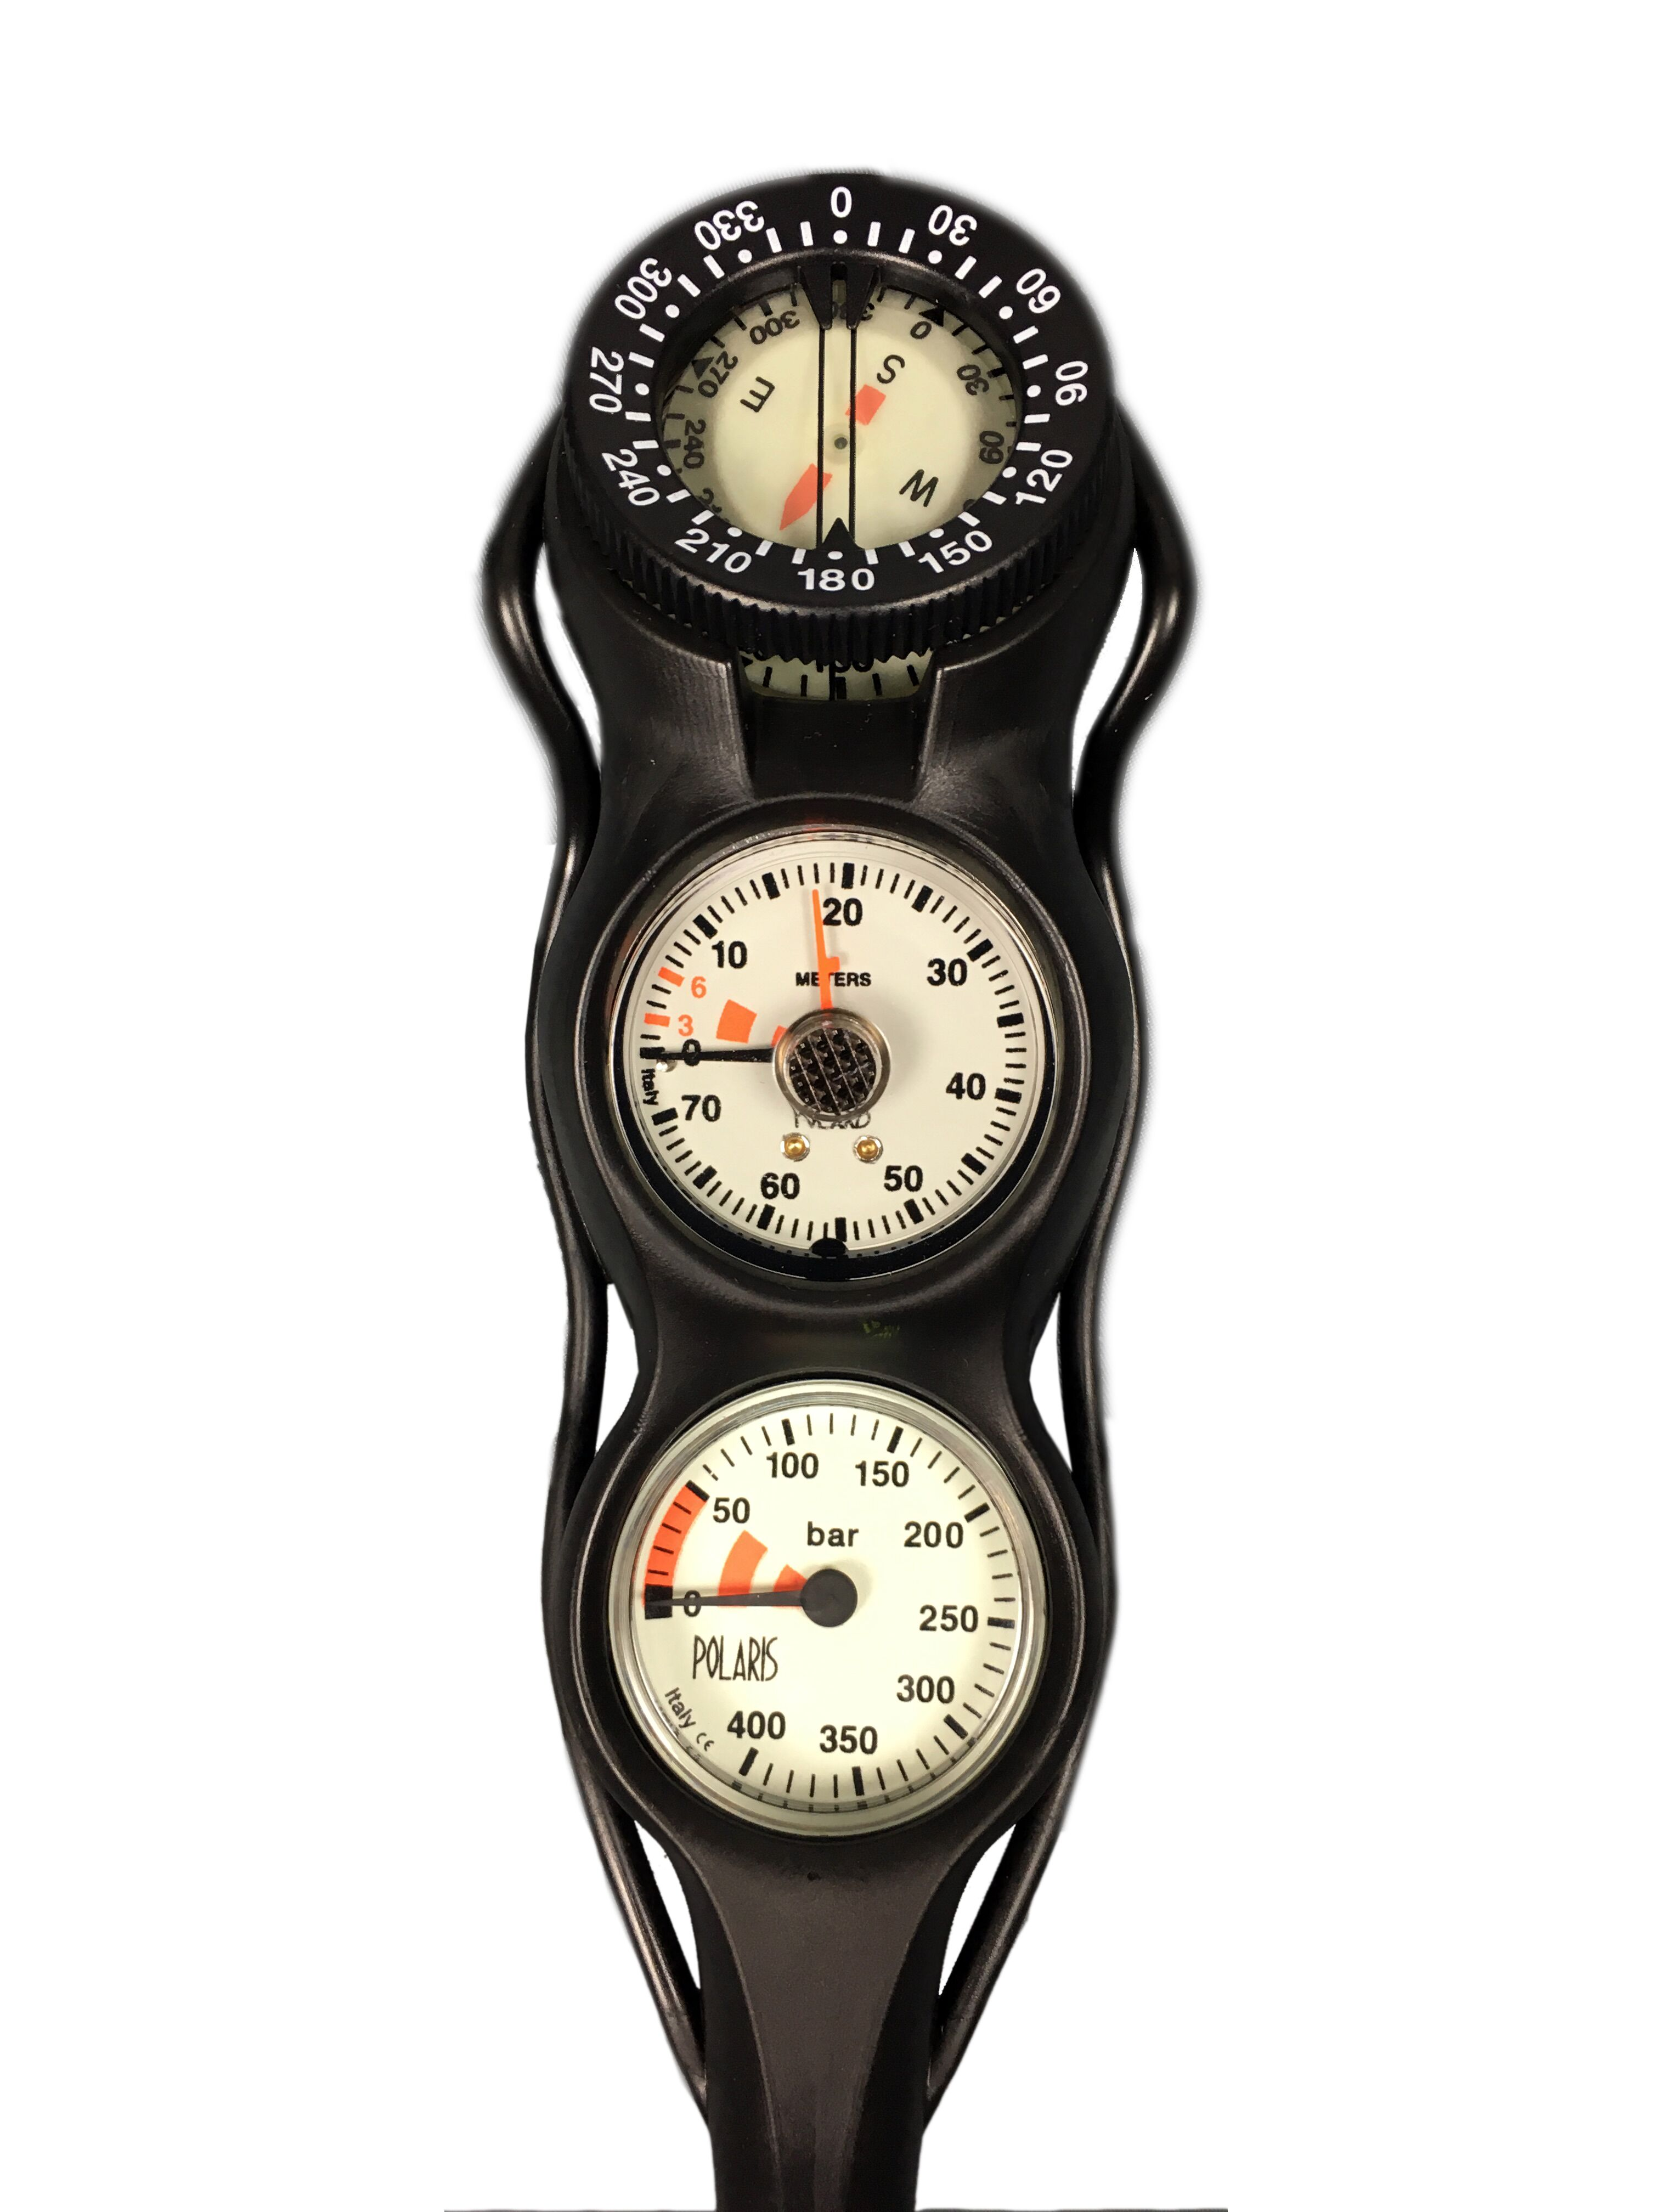 POLARIS - SLIMLINE Dreierkonsole Fini Tiefe Kompass